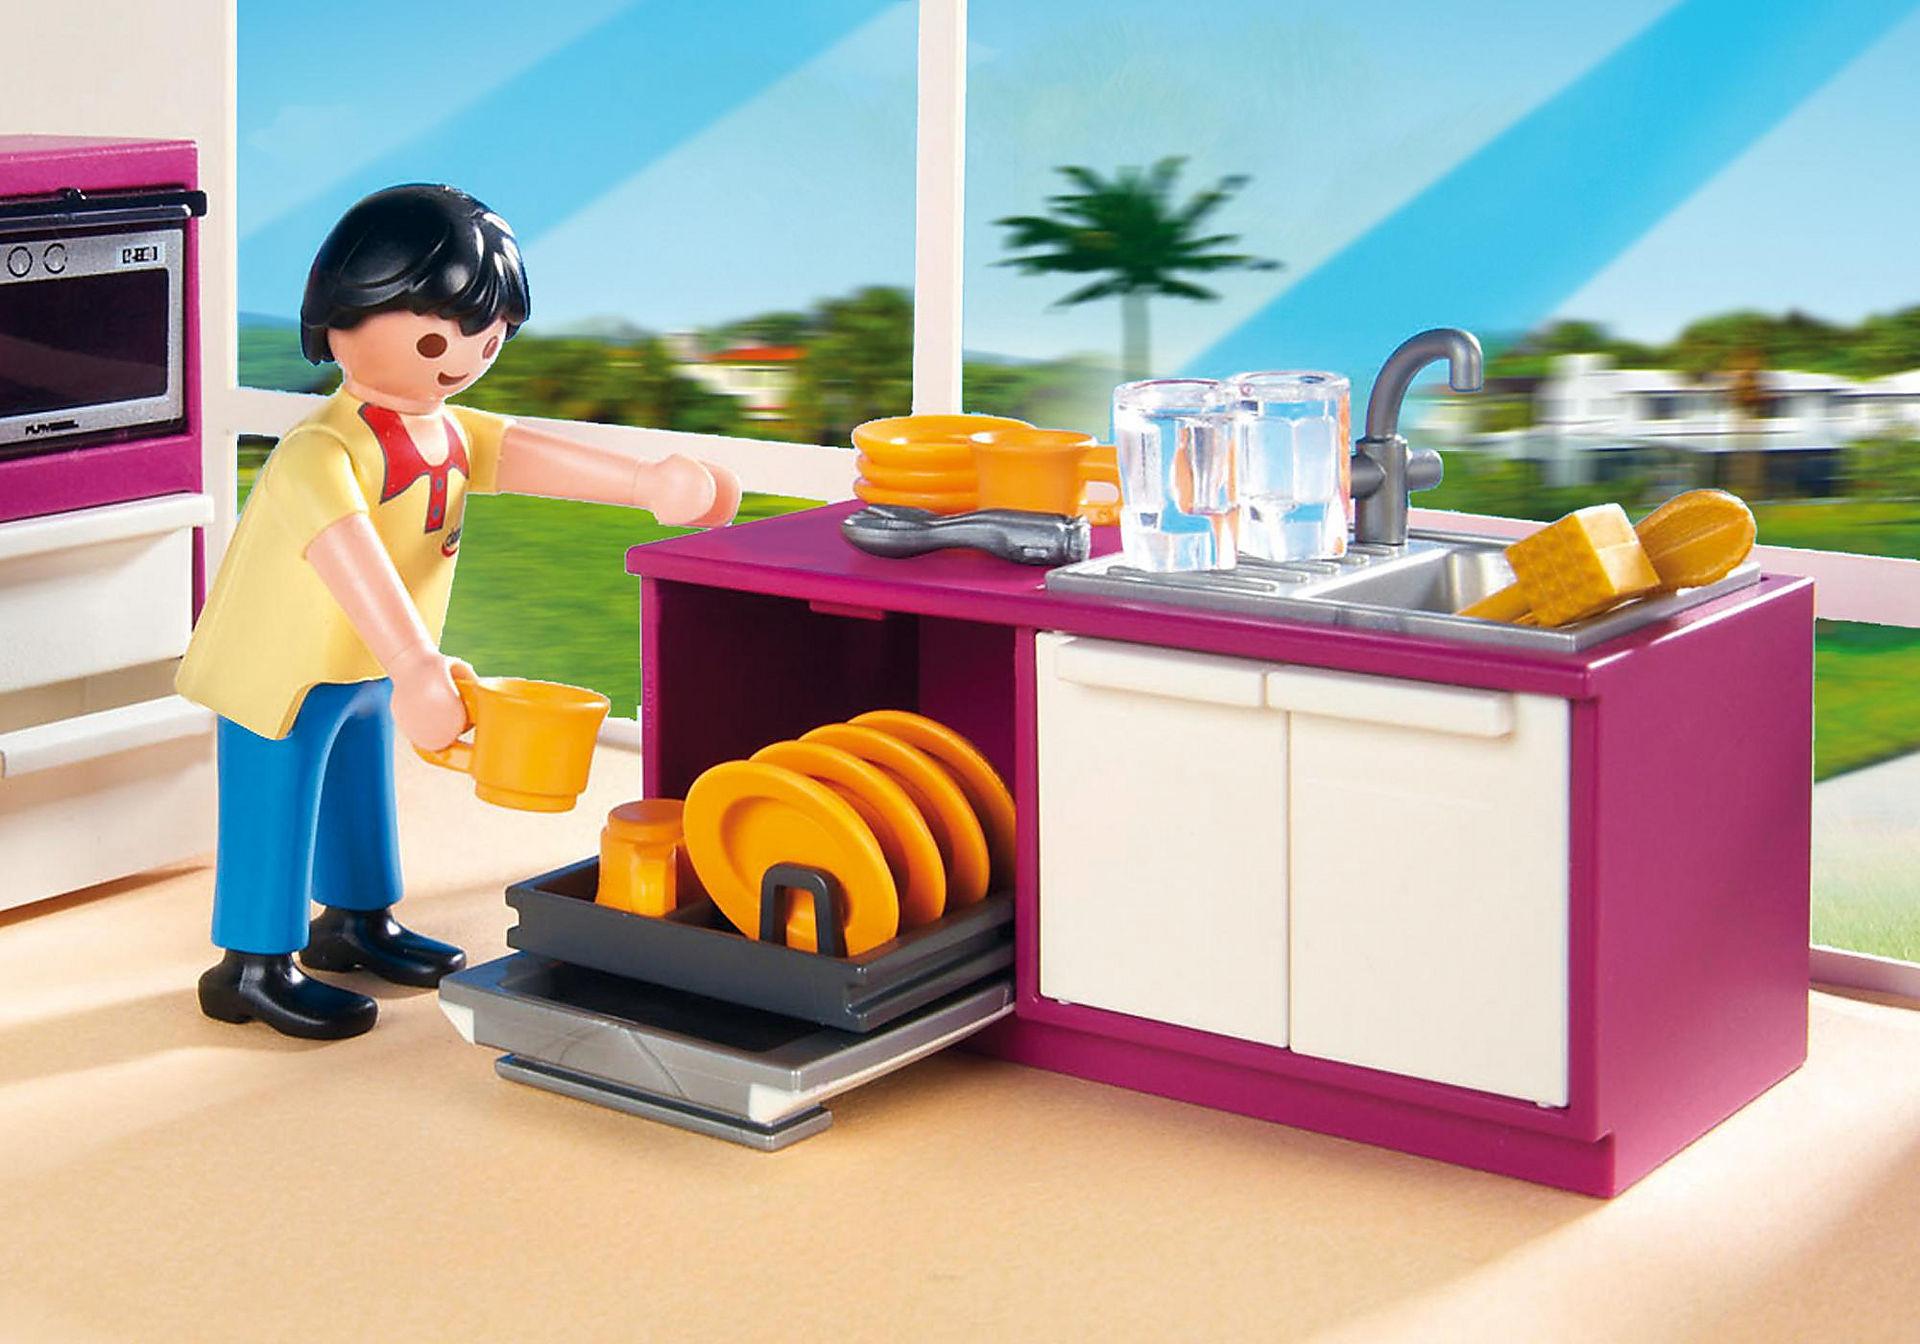 http://media.playmobil.com/i/playmobil/5582_product_extra2/BUCATARIE DE LUX